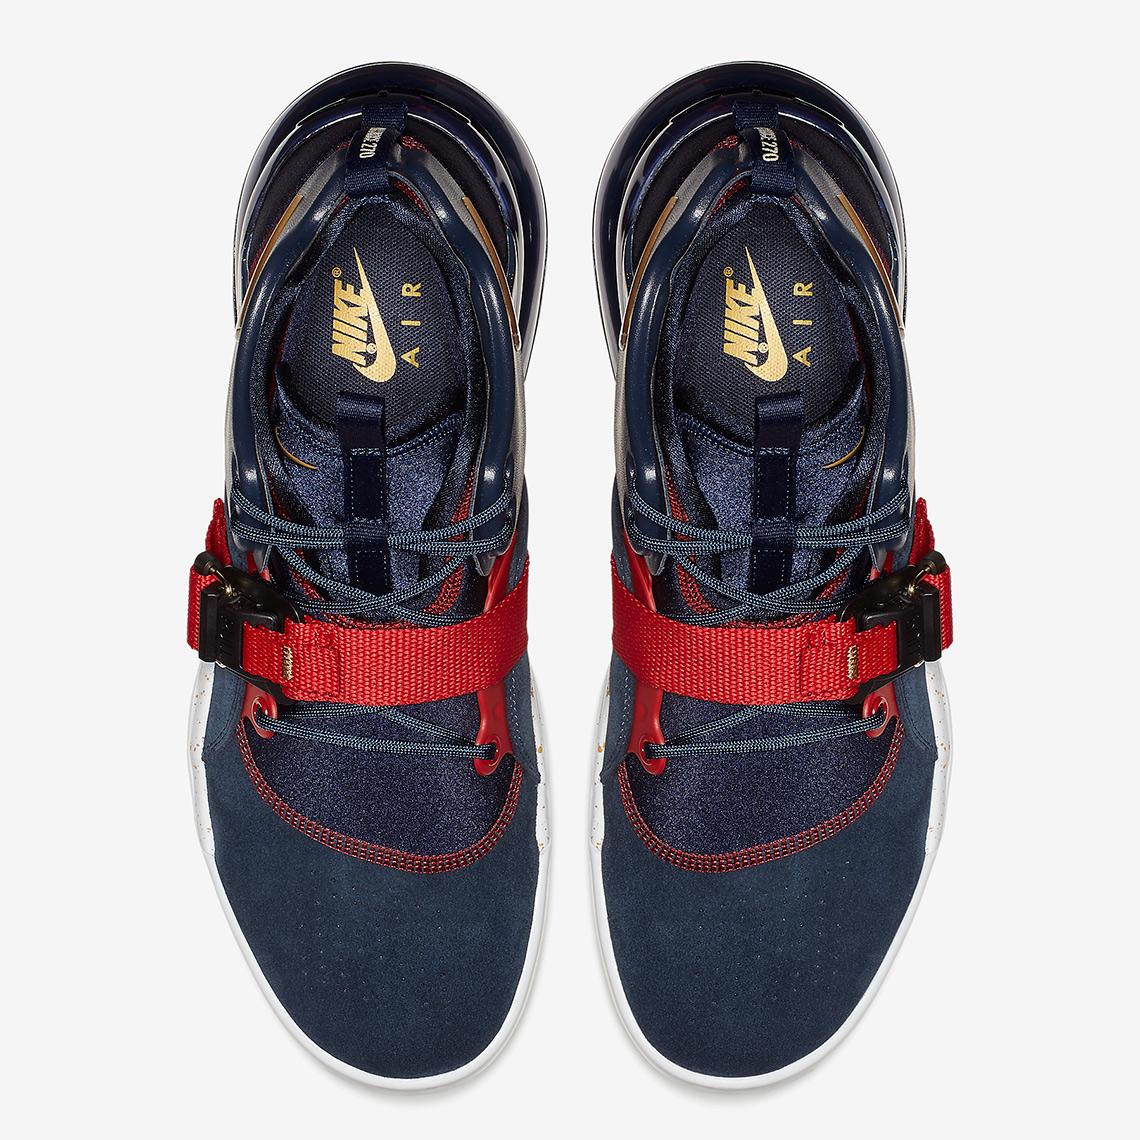 online retailer c9522 cf353 Nike Air Force 270 $160. Style Code: AH6772-400. Advertisement.  Advertisement